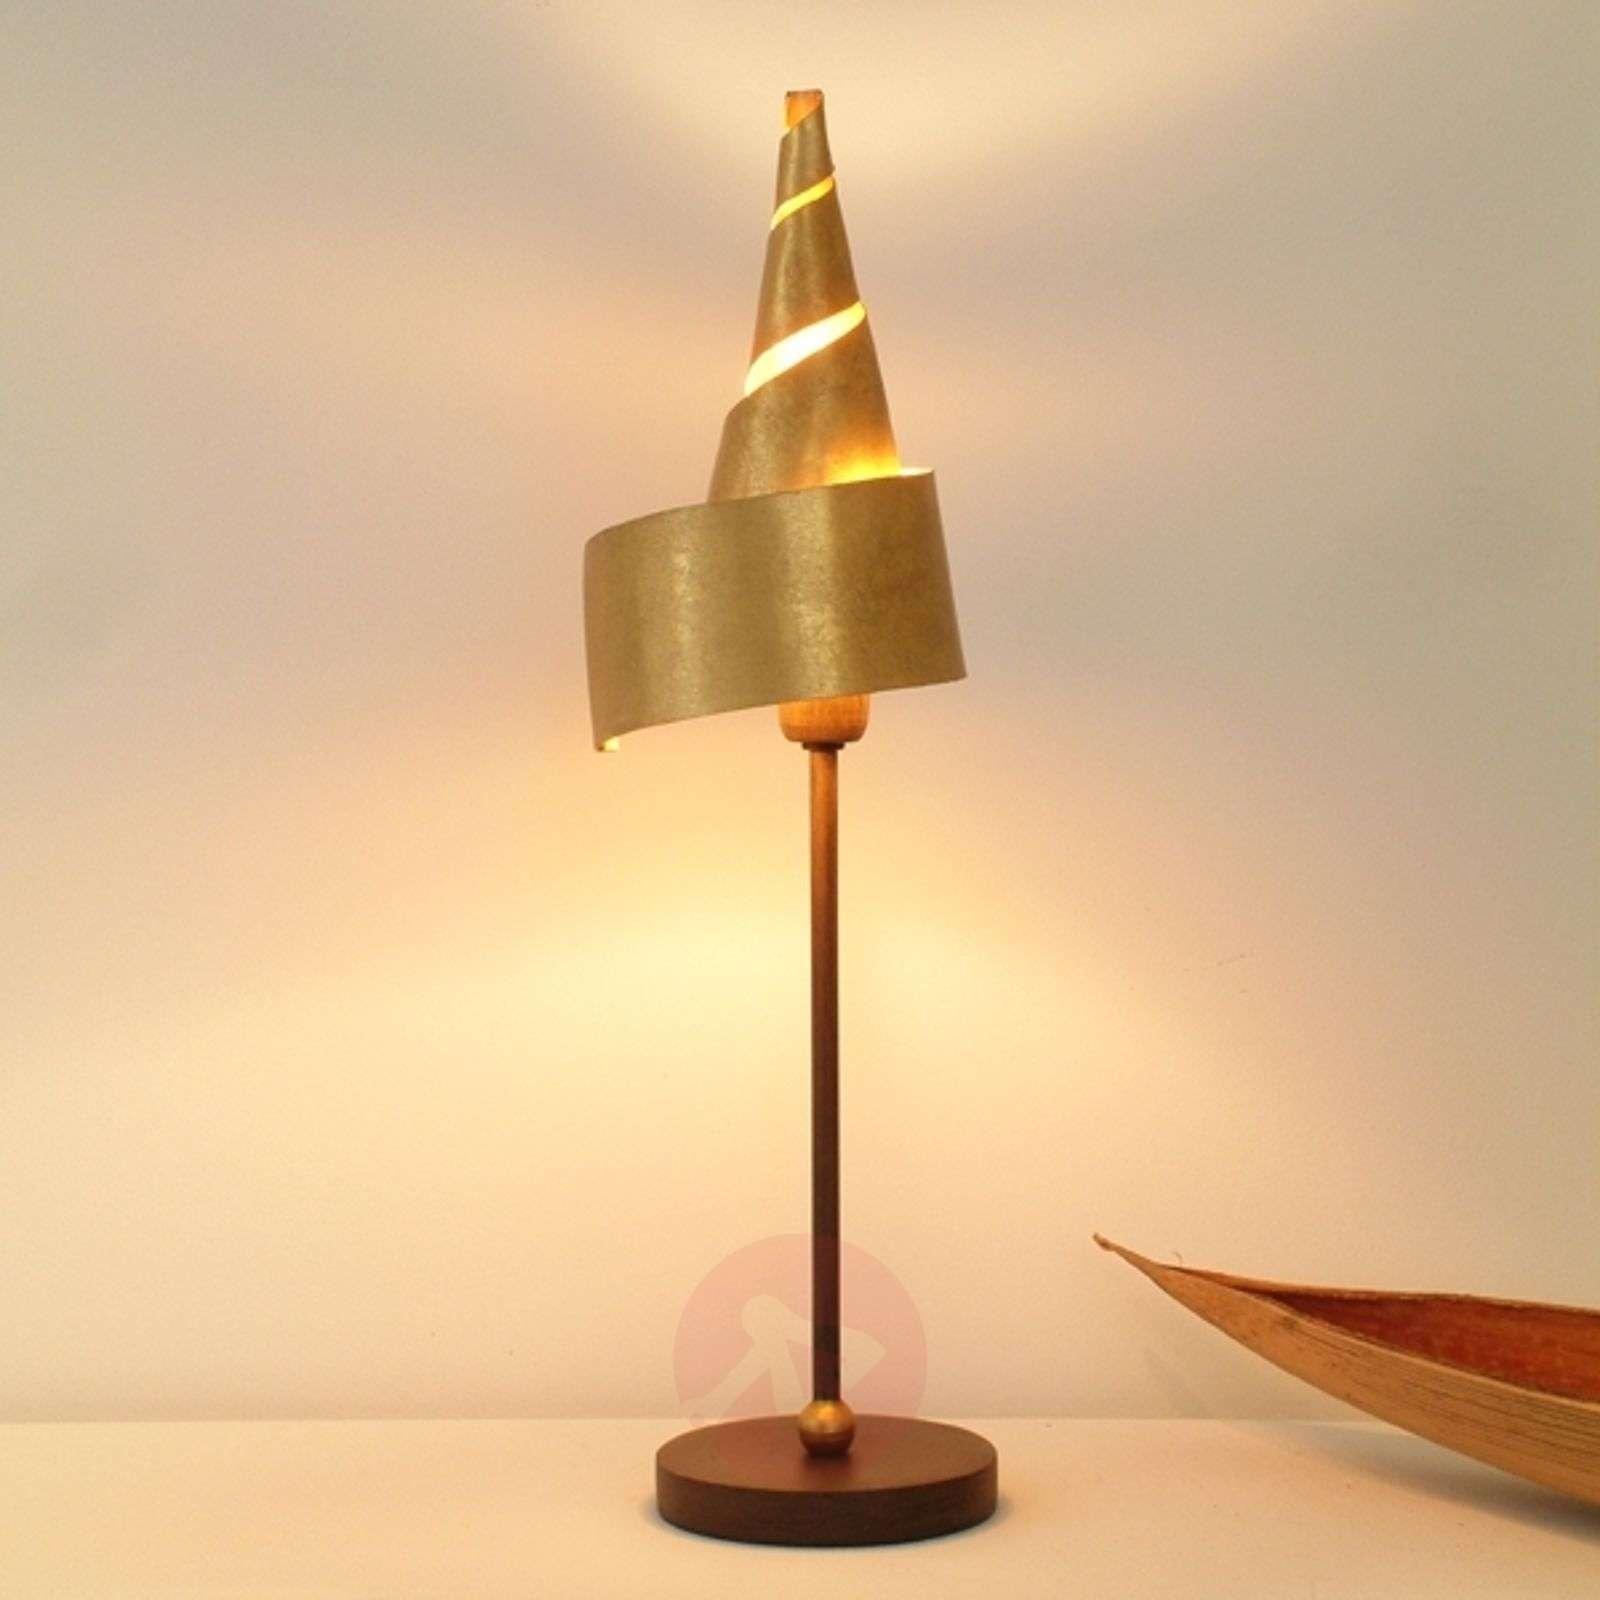 Golden table lamp ZAUBERHUT with metal shade-4512040-01